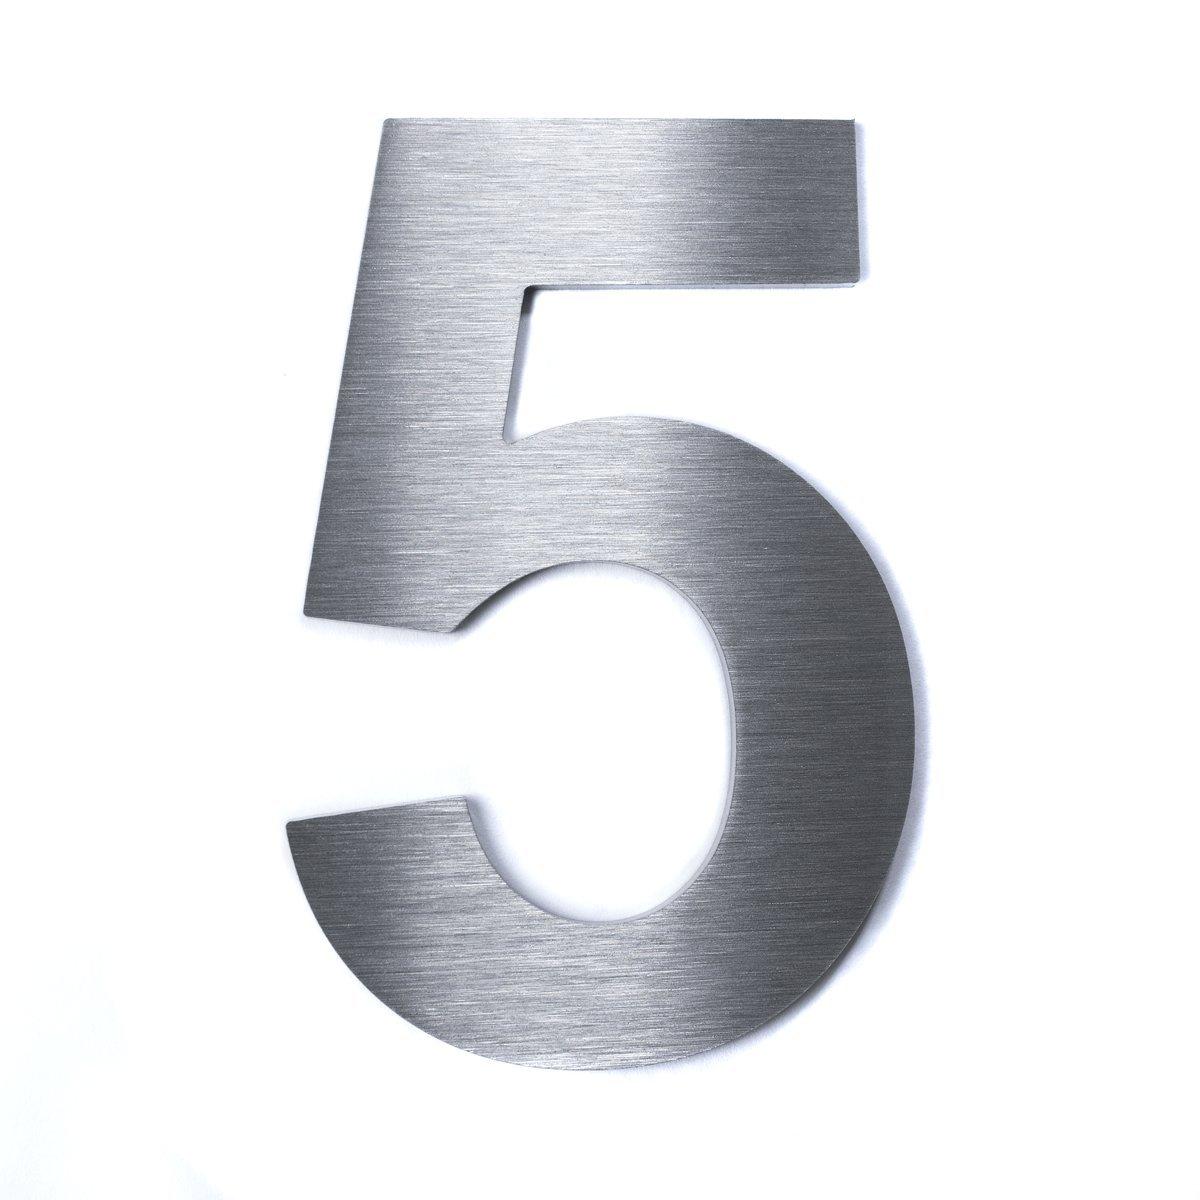 Materialst/ärke Hochwertige Edelstahl V2A HausnummerKlassisch grob geschliffen massiv /& rostfrei H/öhe 2mm 1 200mm